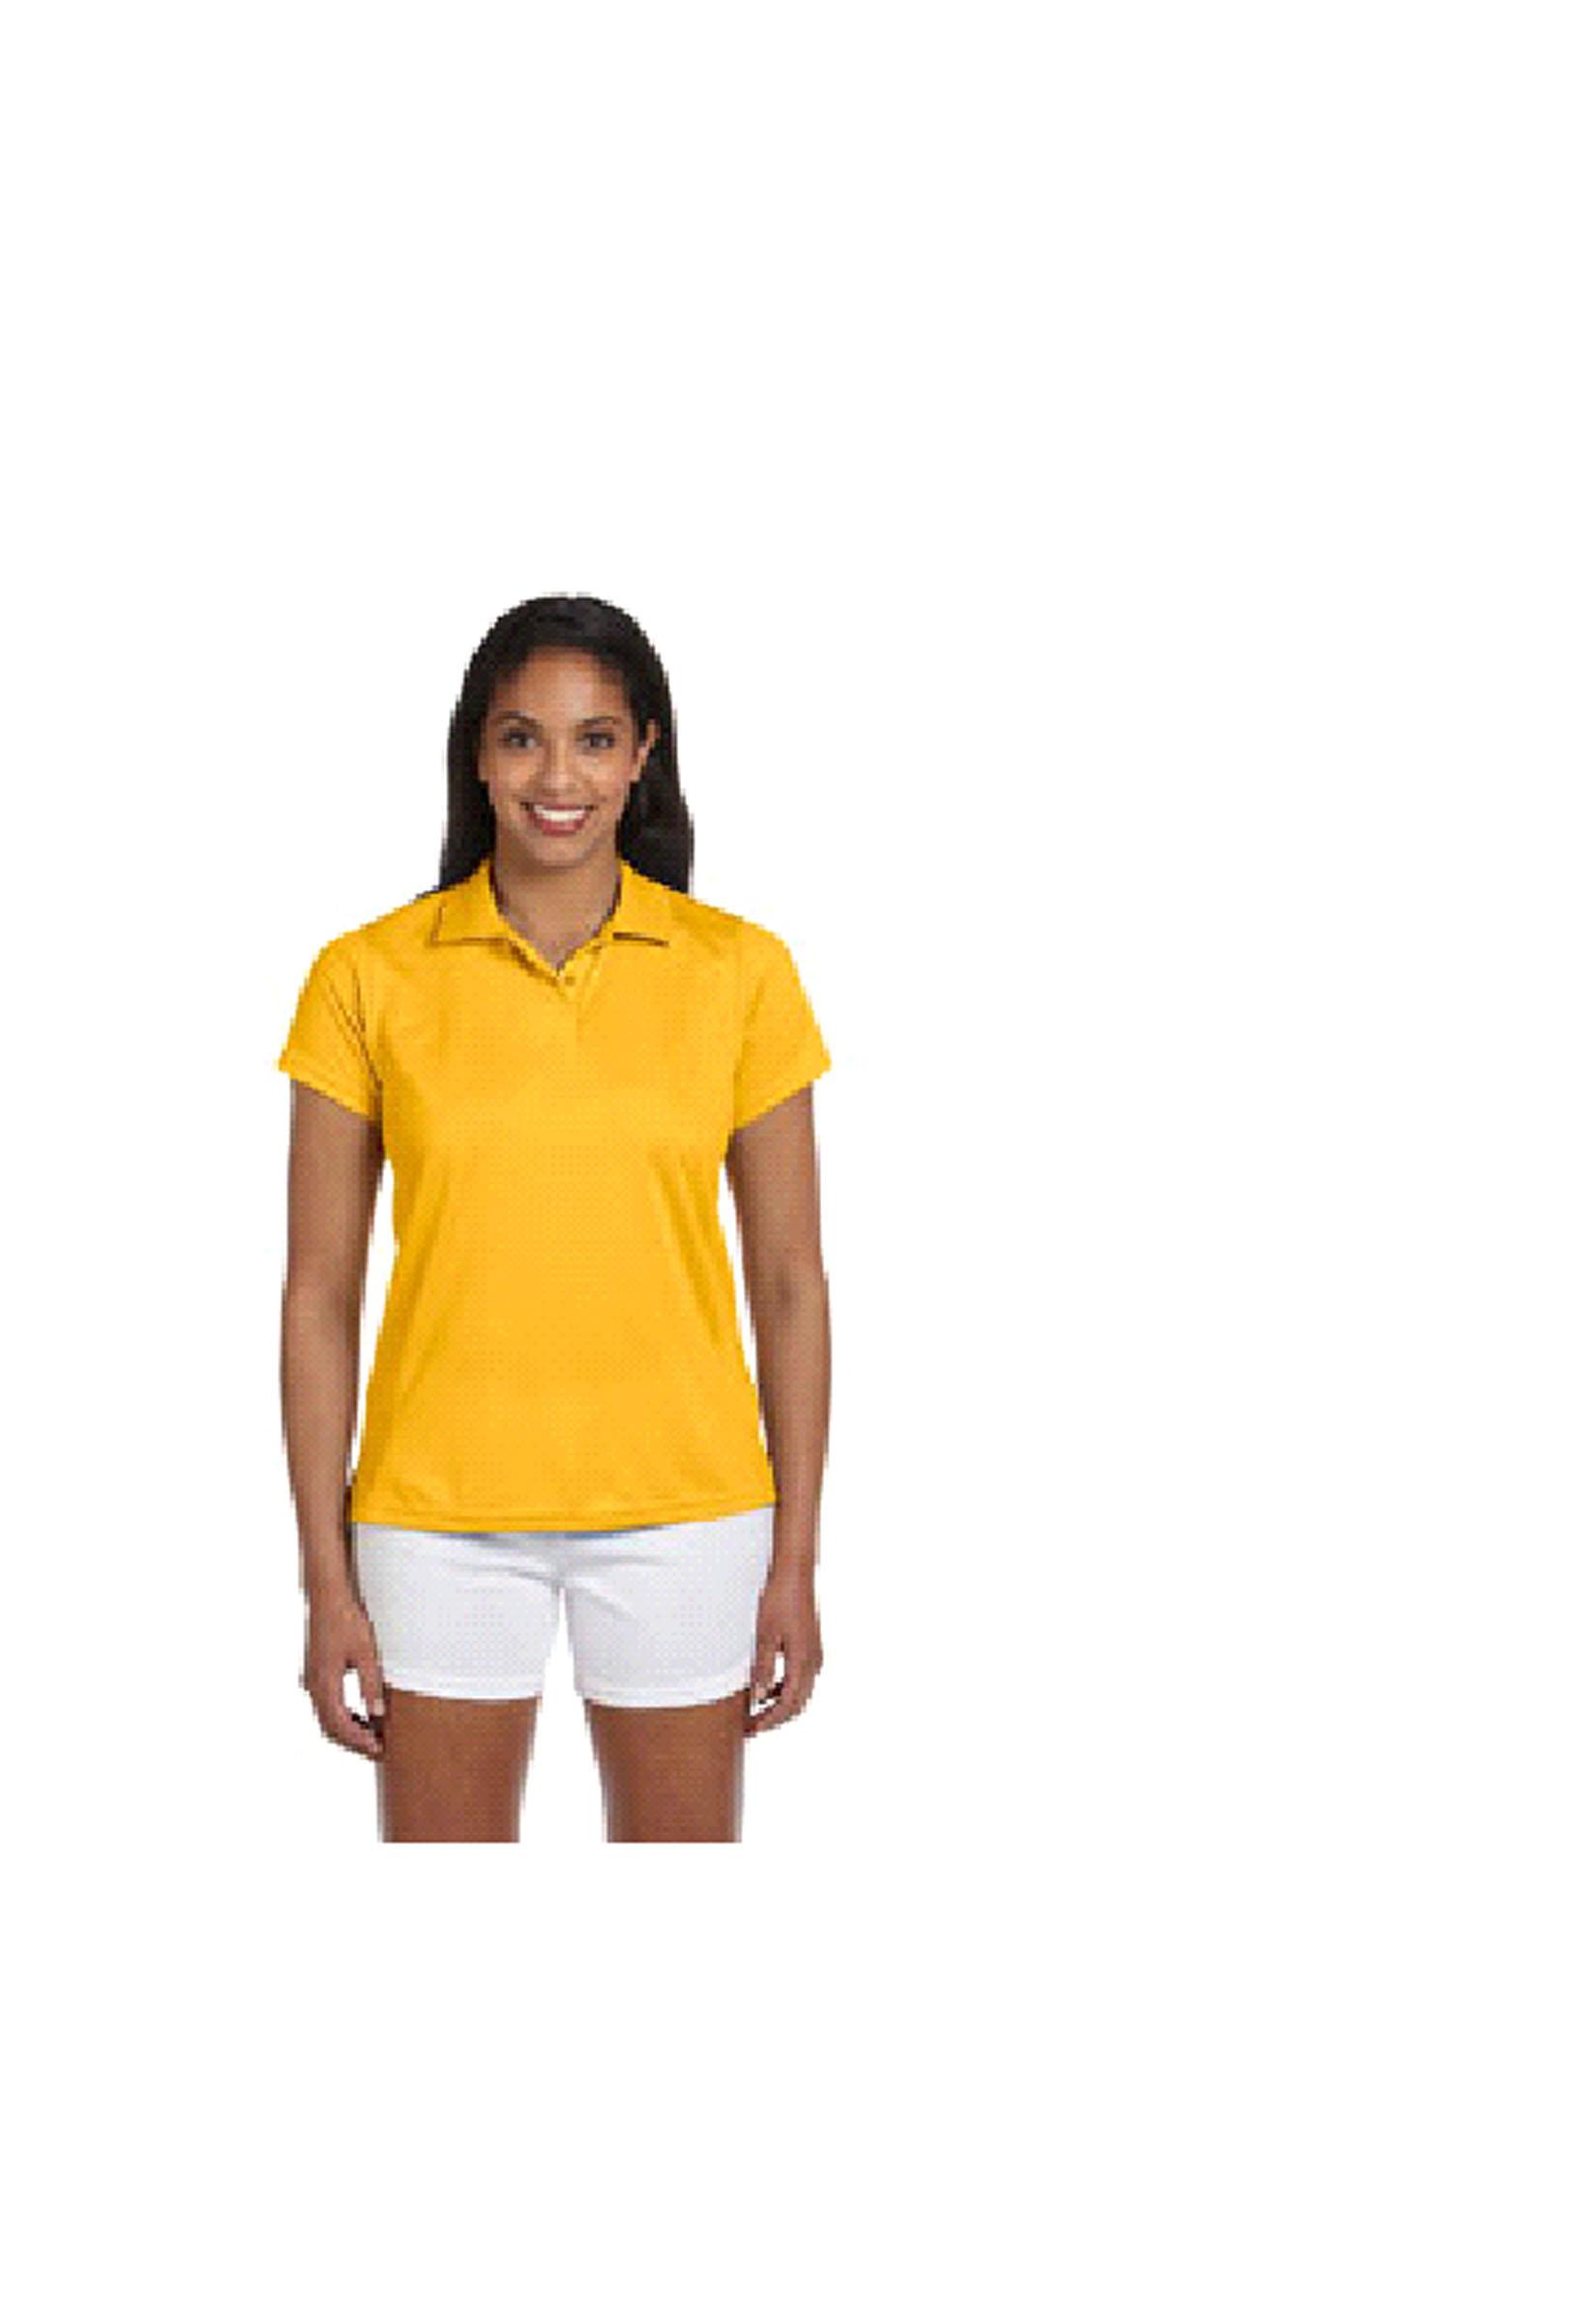 Click image for larger version  Name:Ladies Shirt.jpg Views:36 Size:195.3 KB ID:2003632